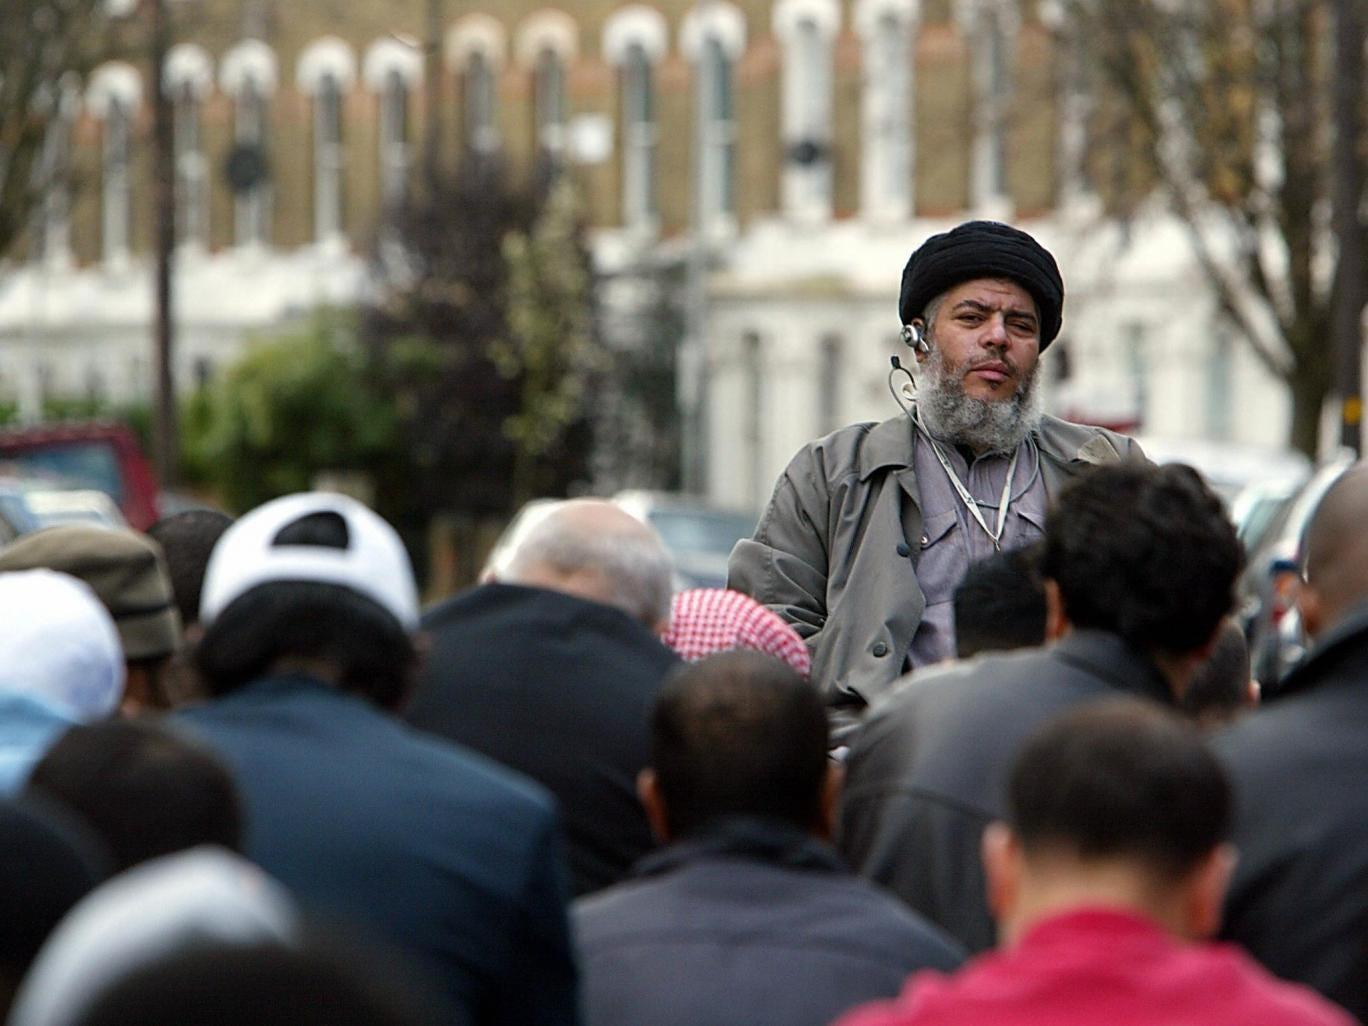 Imam Abu Hamza addresses followers in Finsbury Park in 2004